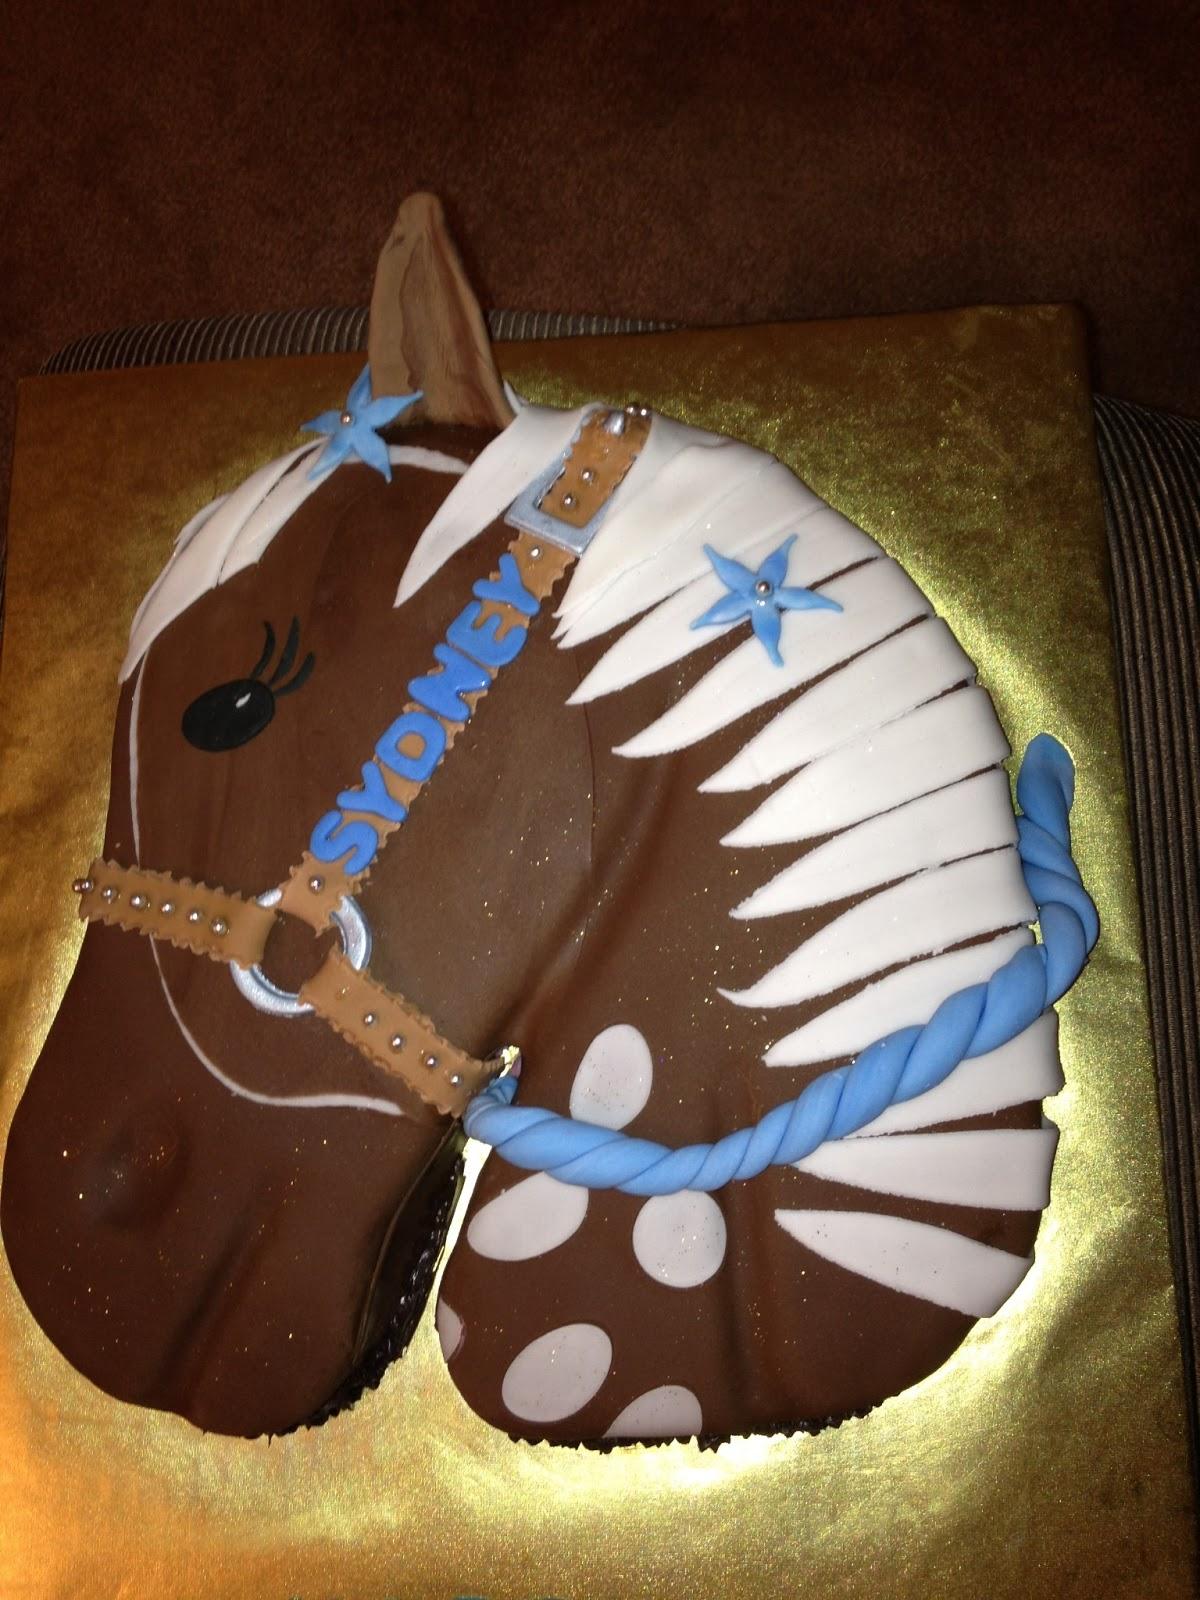 La S Cakes Horse Head Cake